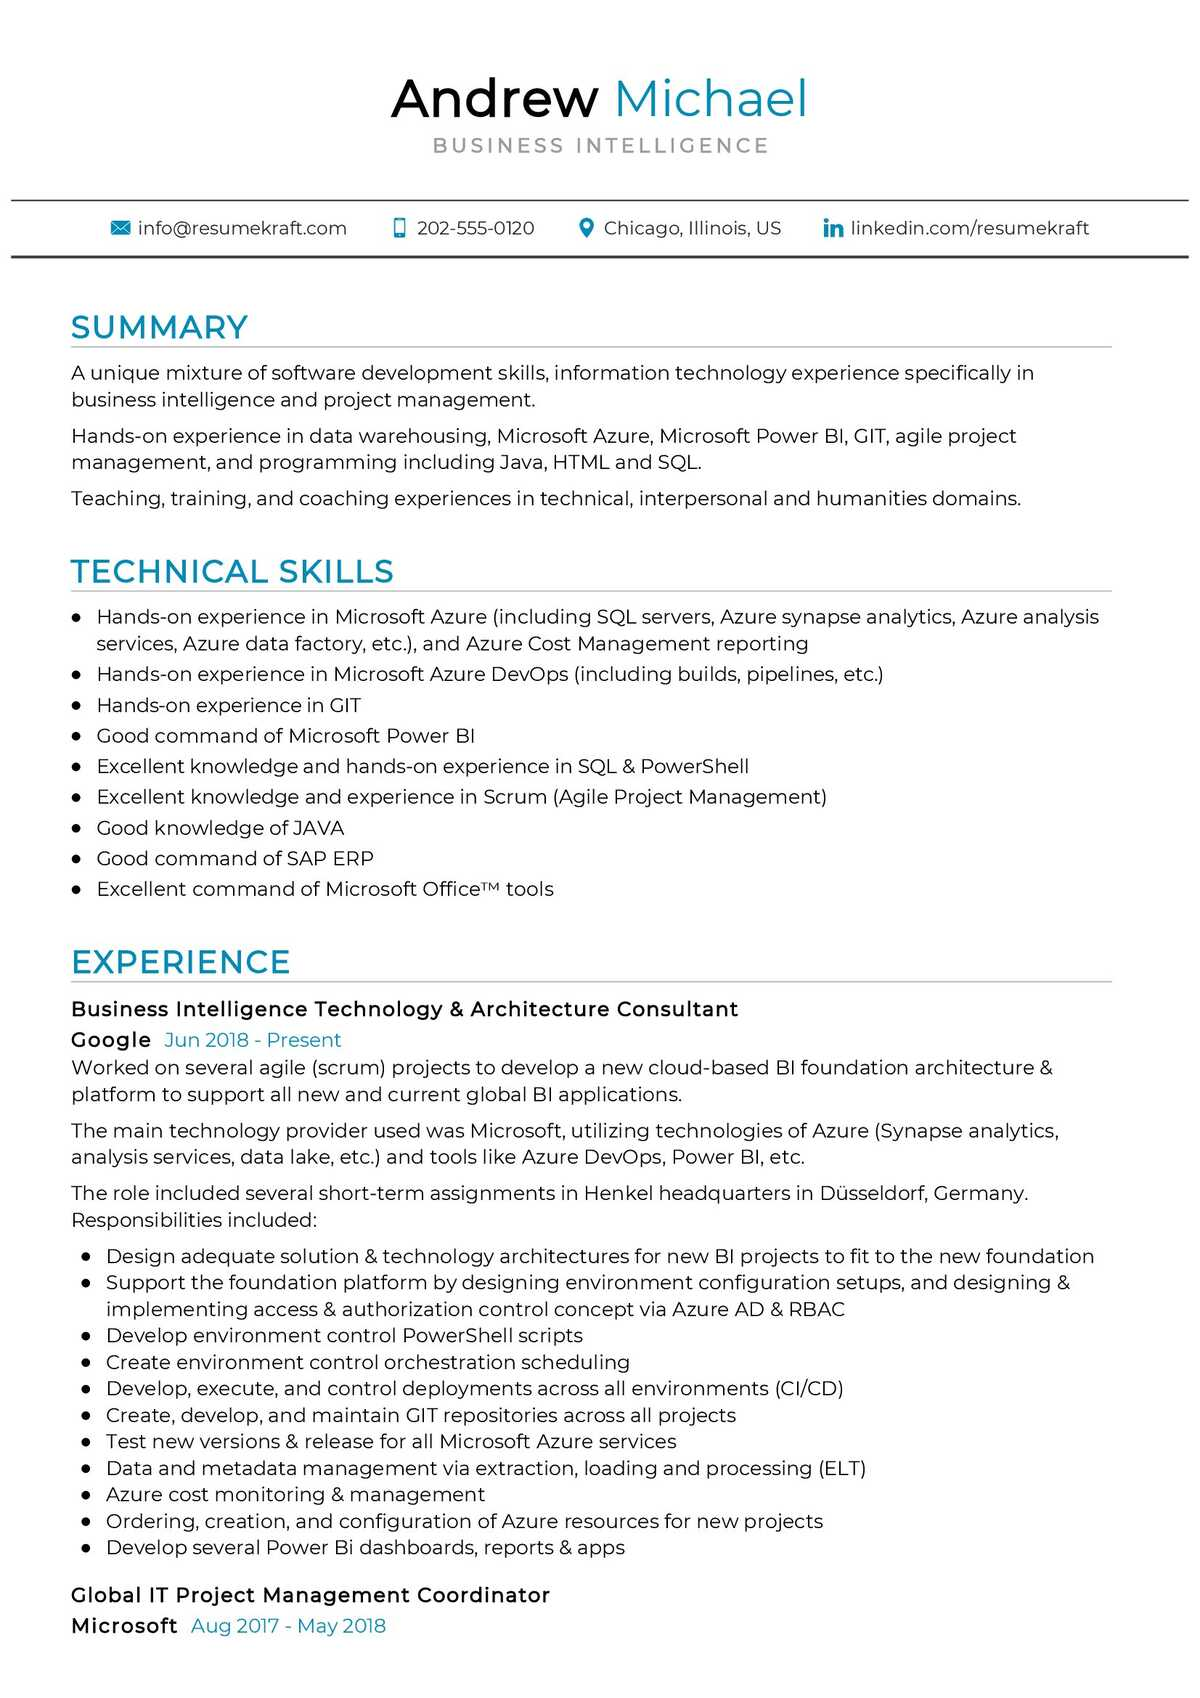 business intelligence resume sample  resumekraft